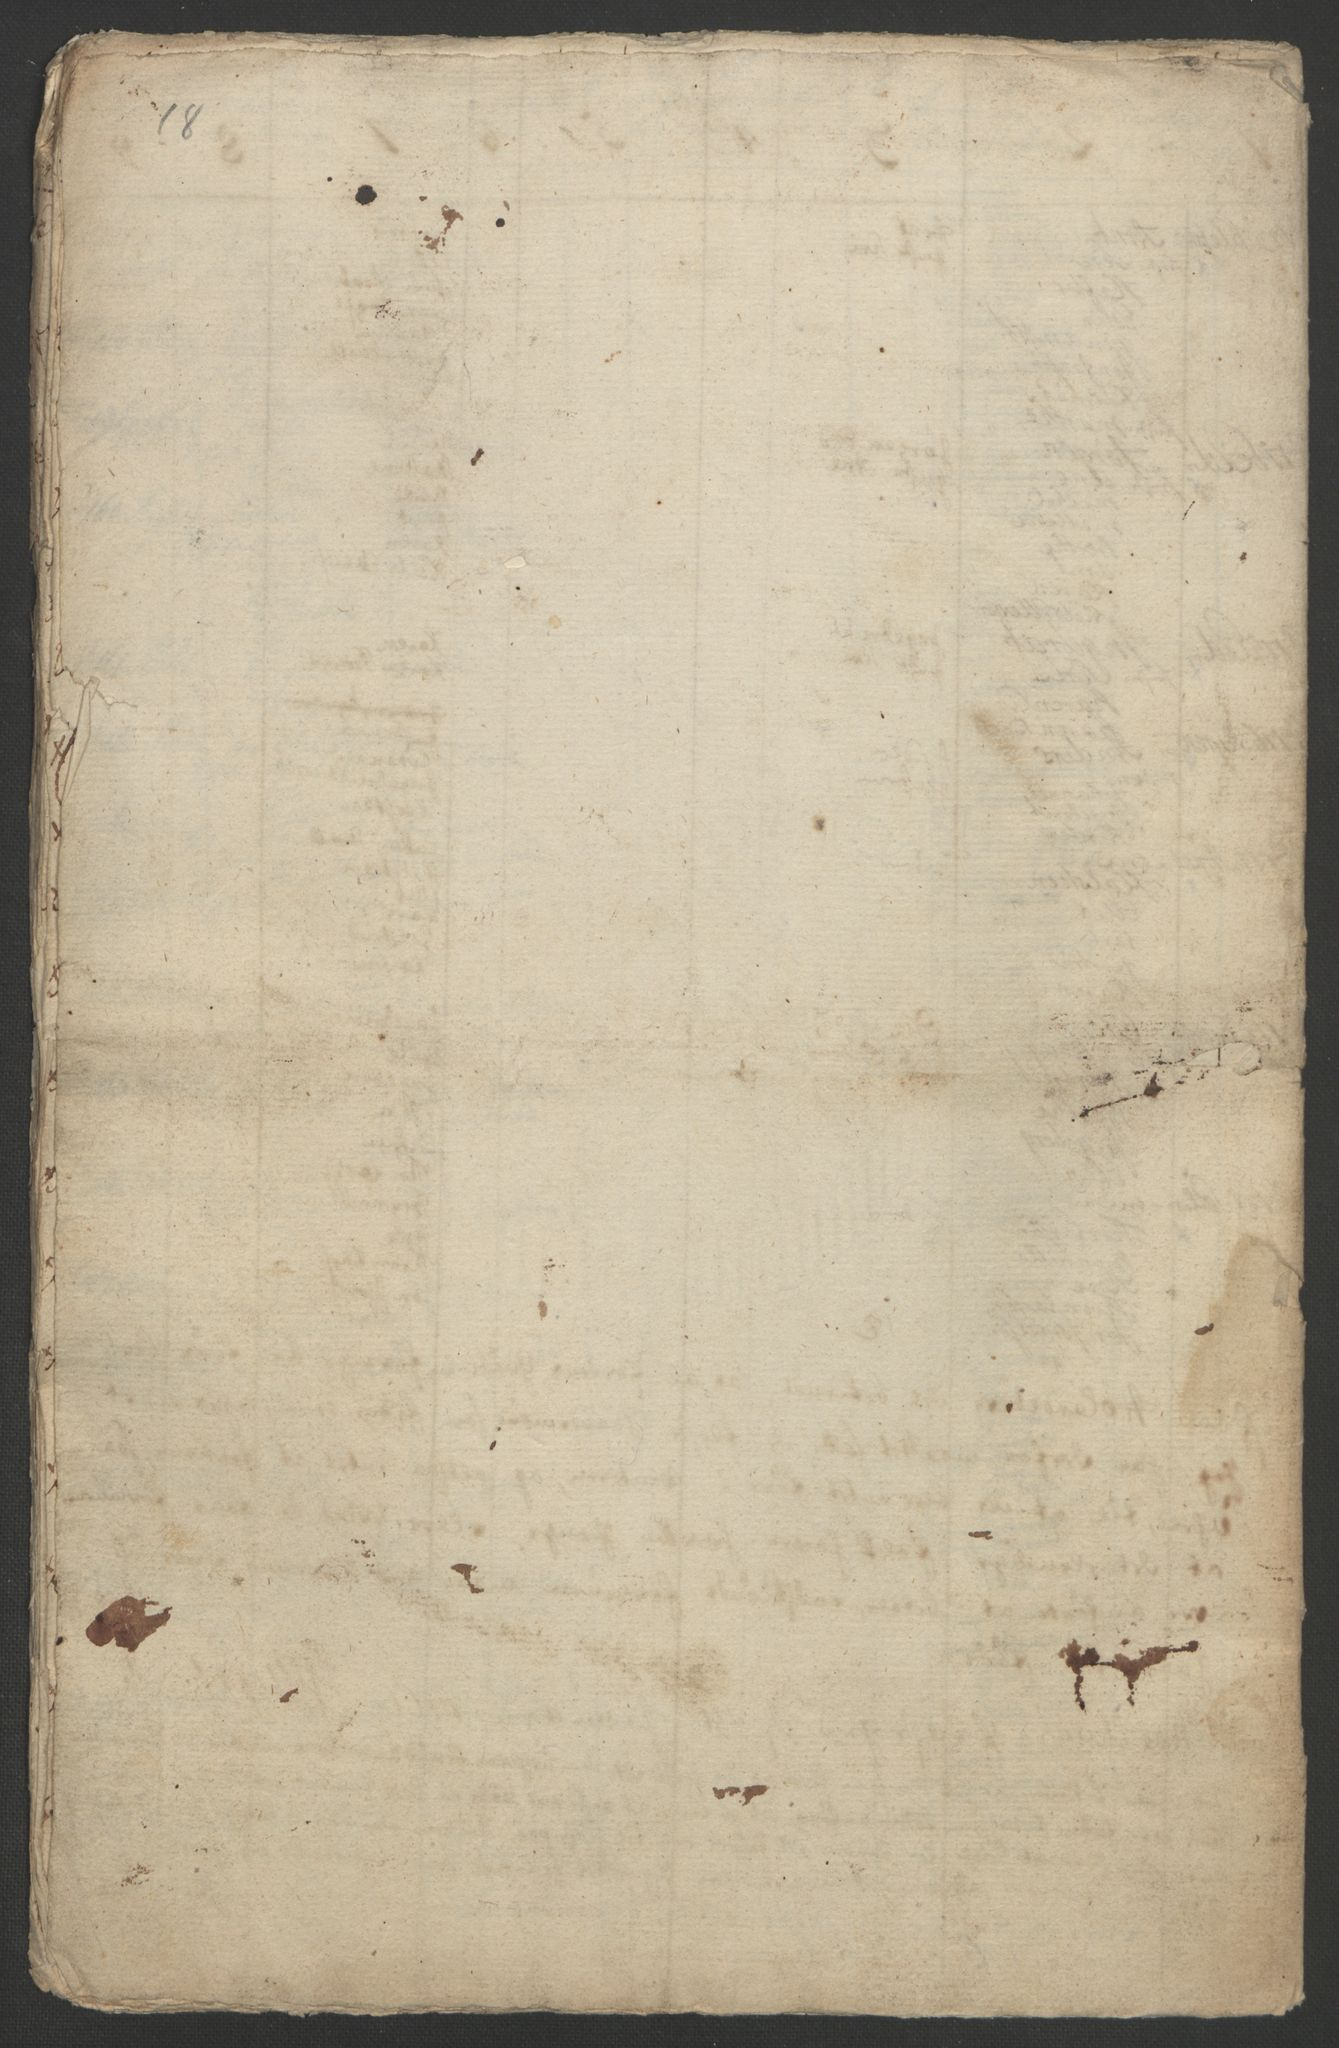 RA, Rentekammeret inntil 1814, Realistisk ordnet avdeling, Ol/L0021: [Gg 10]: Ekstraskatten, 23.09.1762. Orkdal og Gauldal, 1762-1767, s. 526